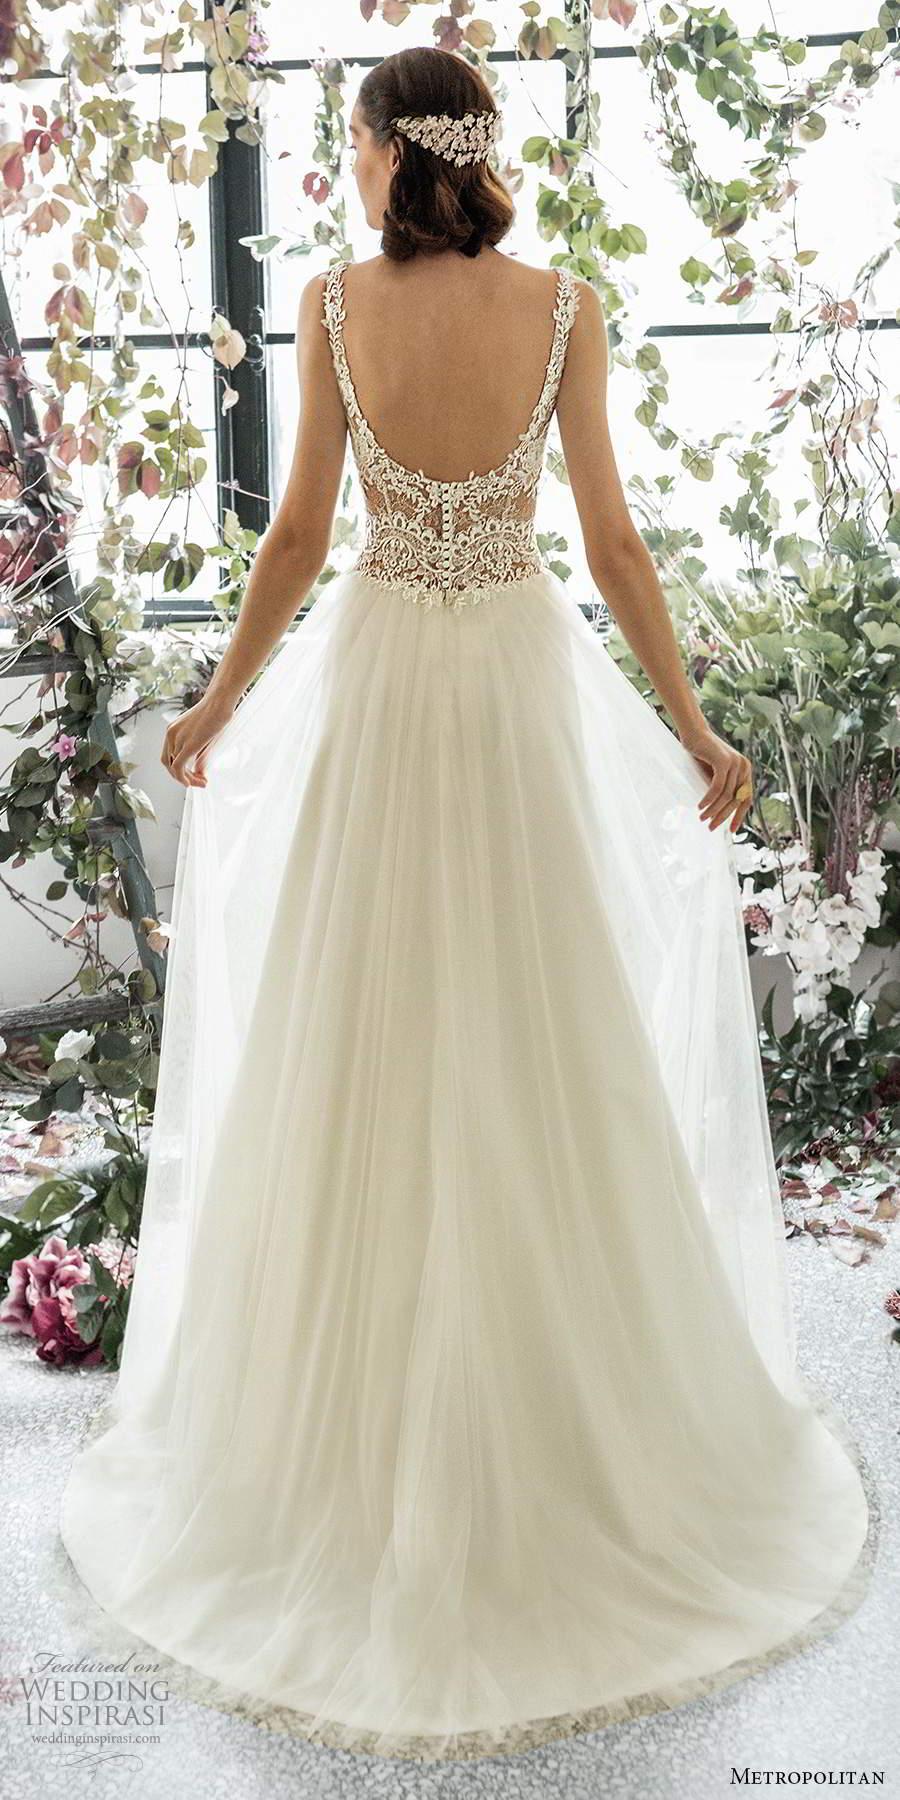 metropolitan spring 2020 bridal sleeveless lace straps embellished lace sheer bodice romantic a line wedding dress (6) scoop back chapel train bv